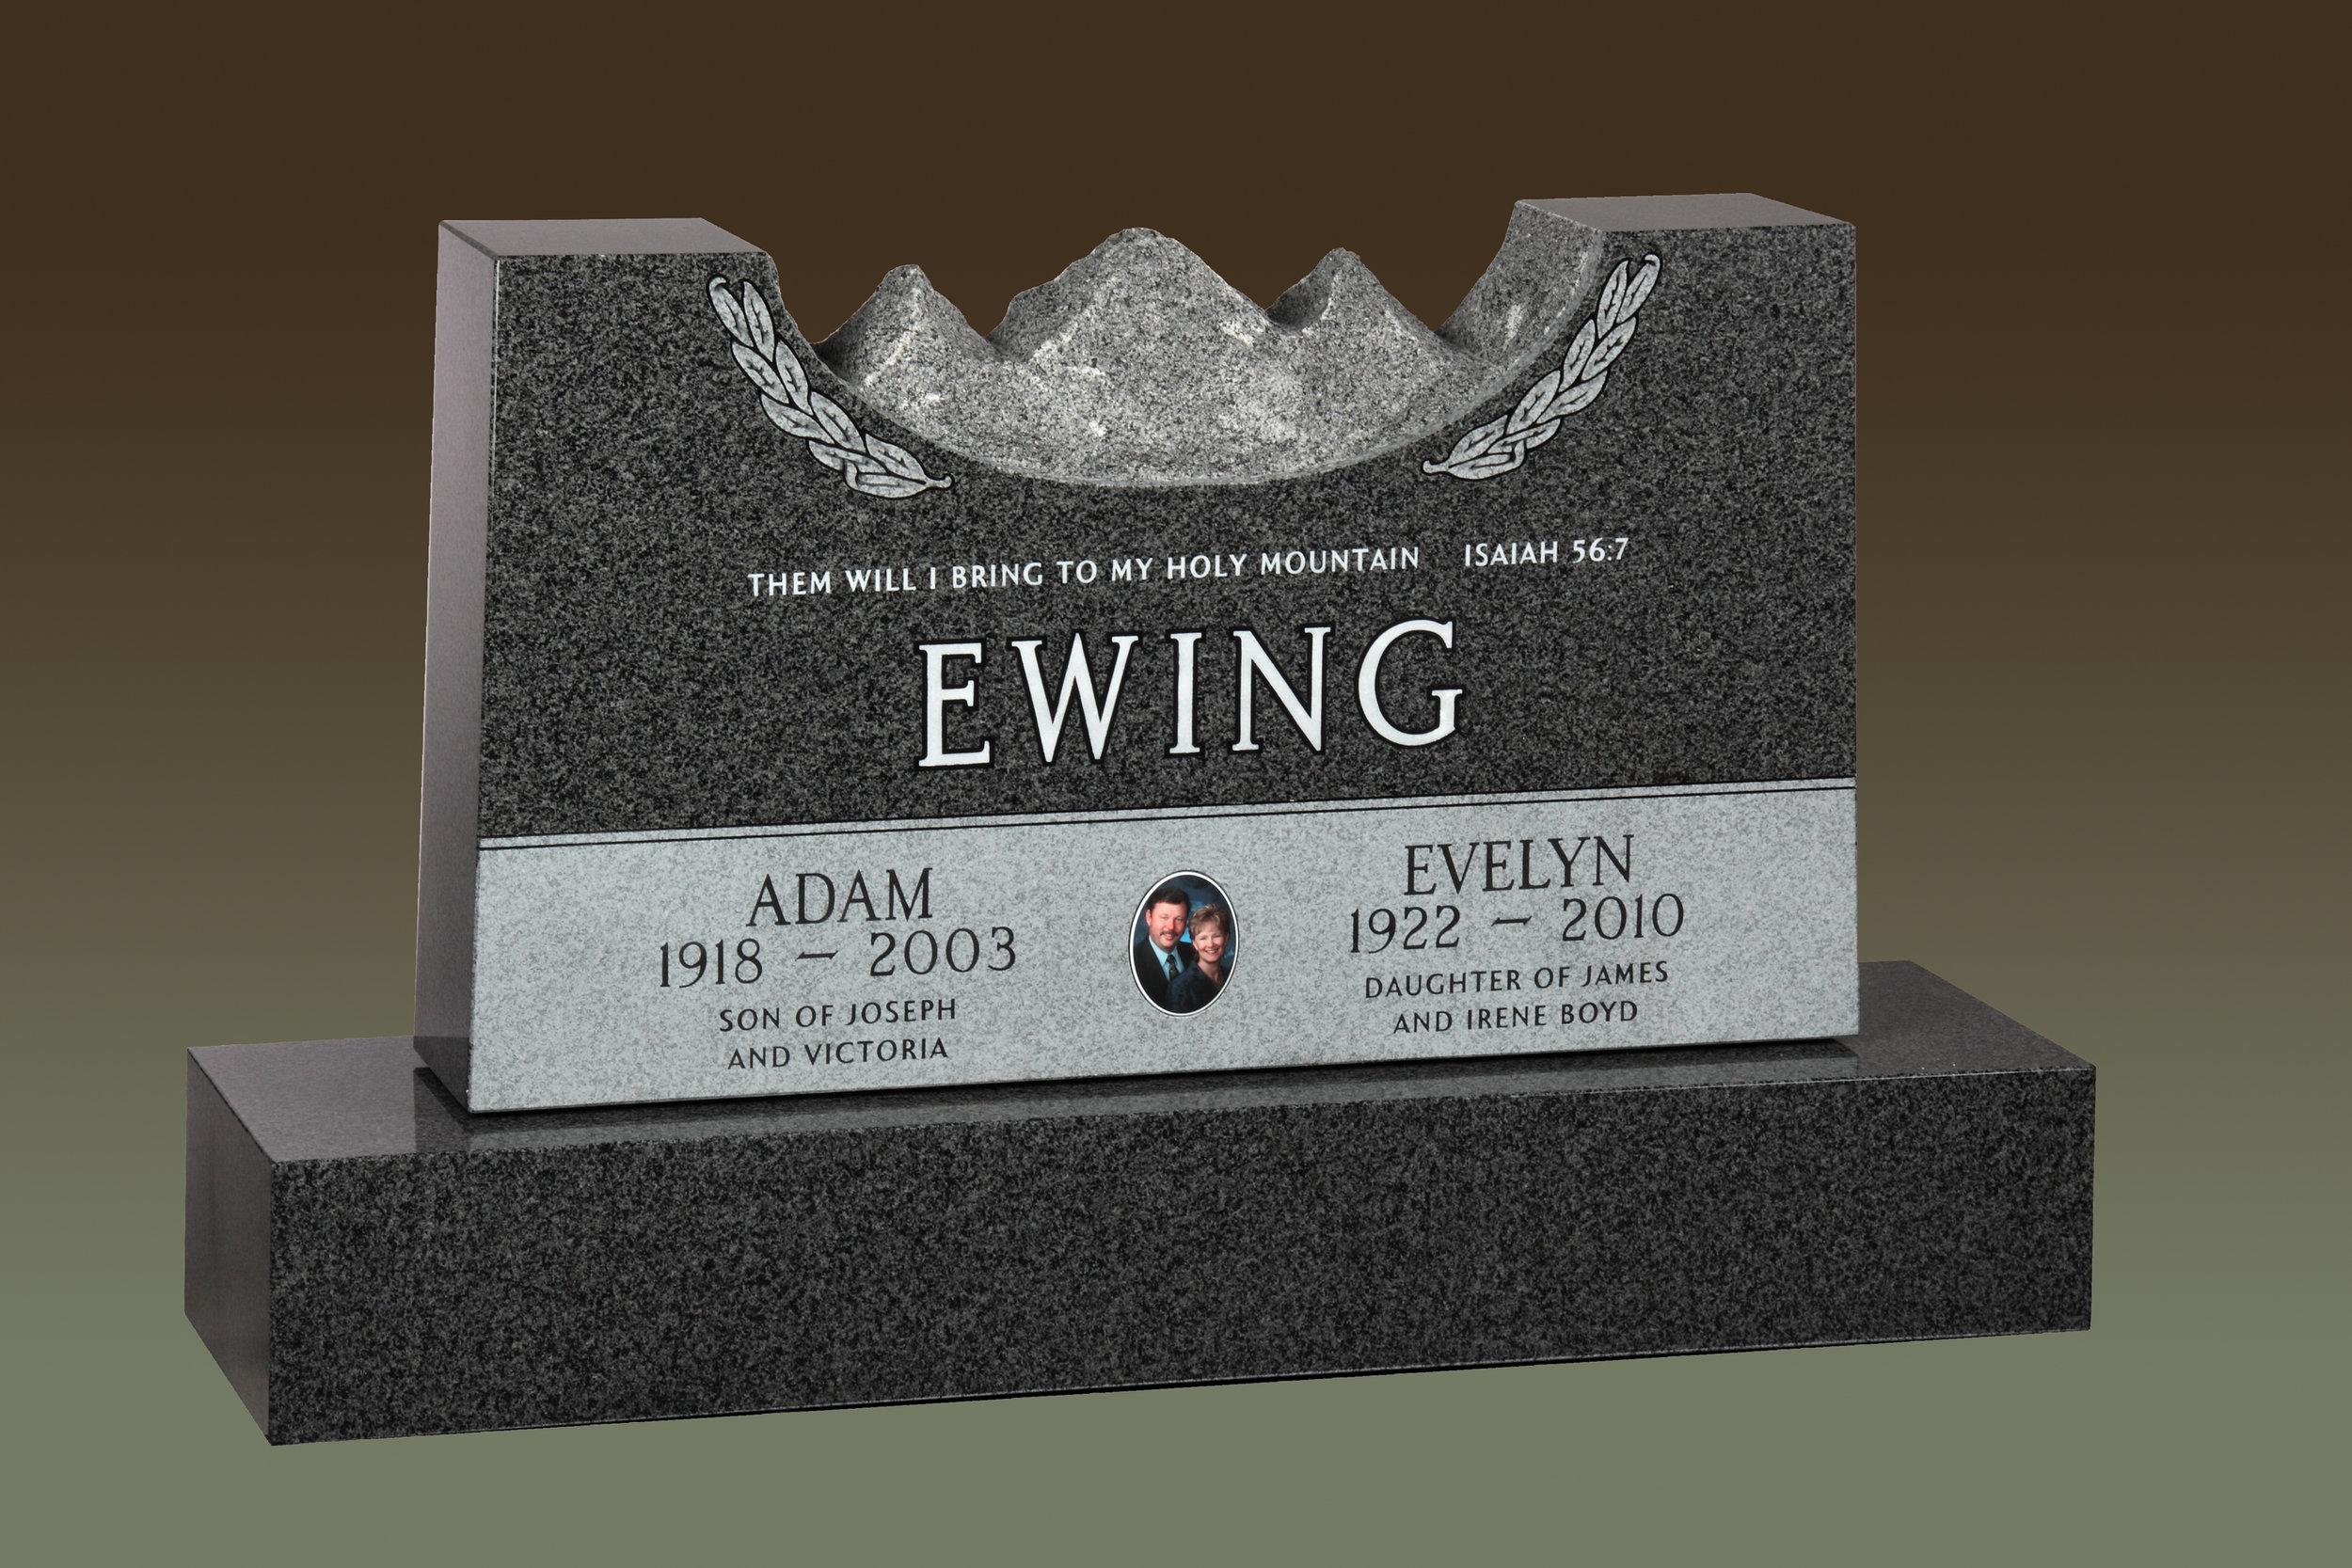 RM-8911 Ewing.jpg